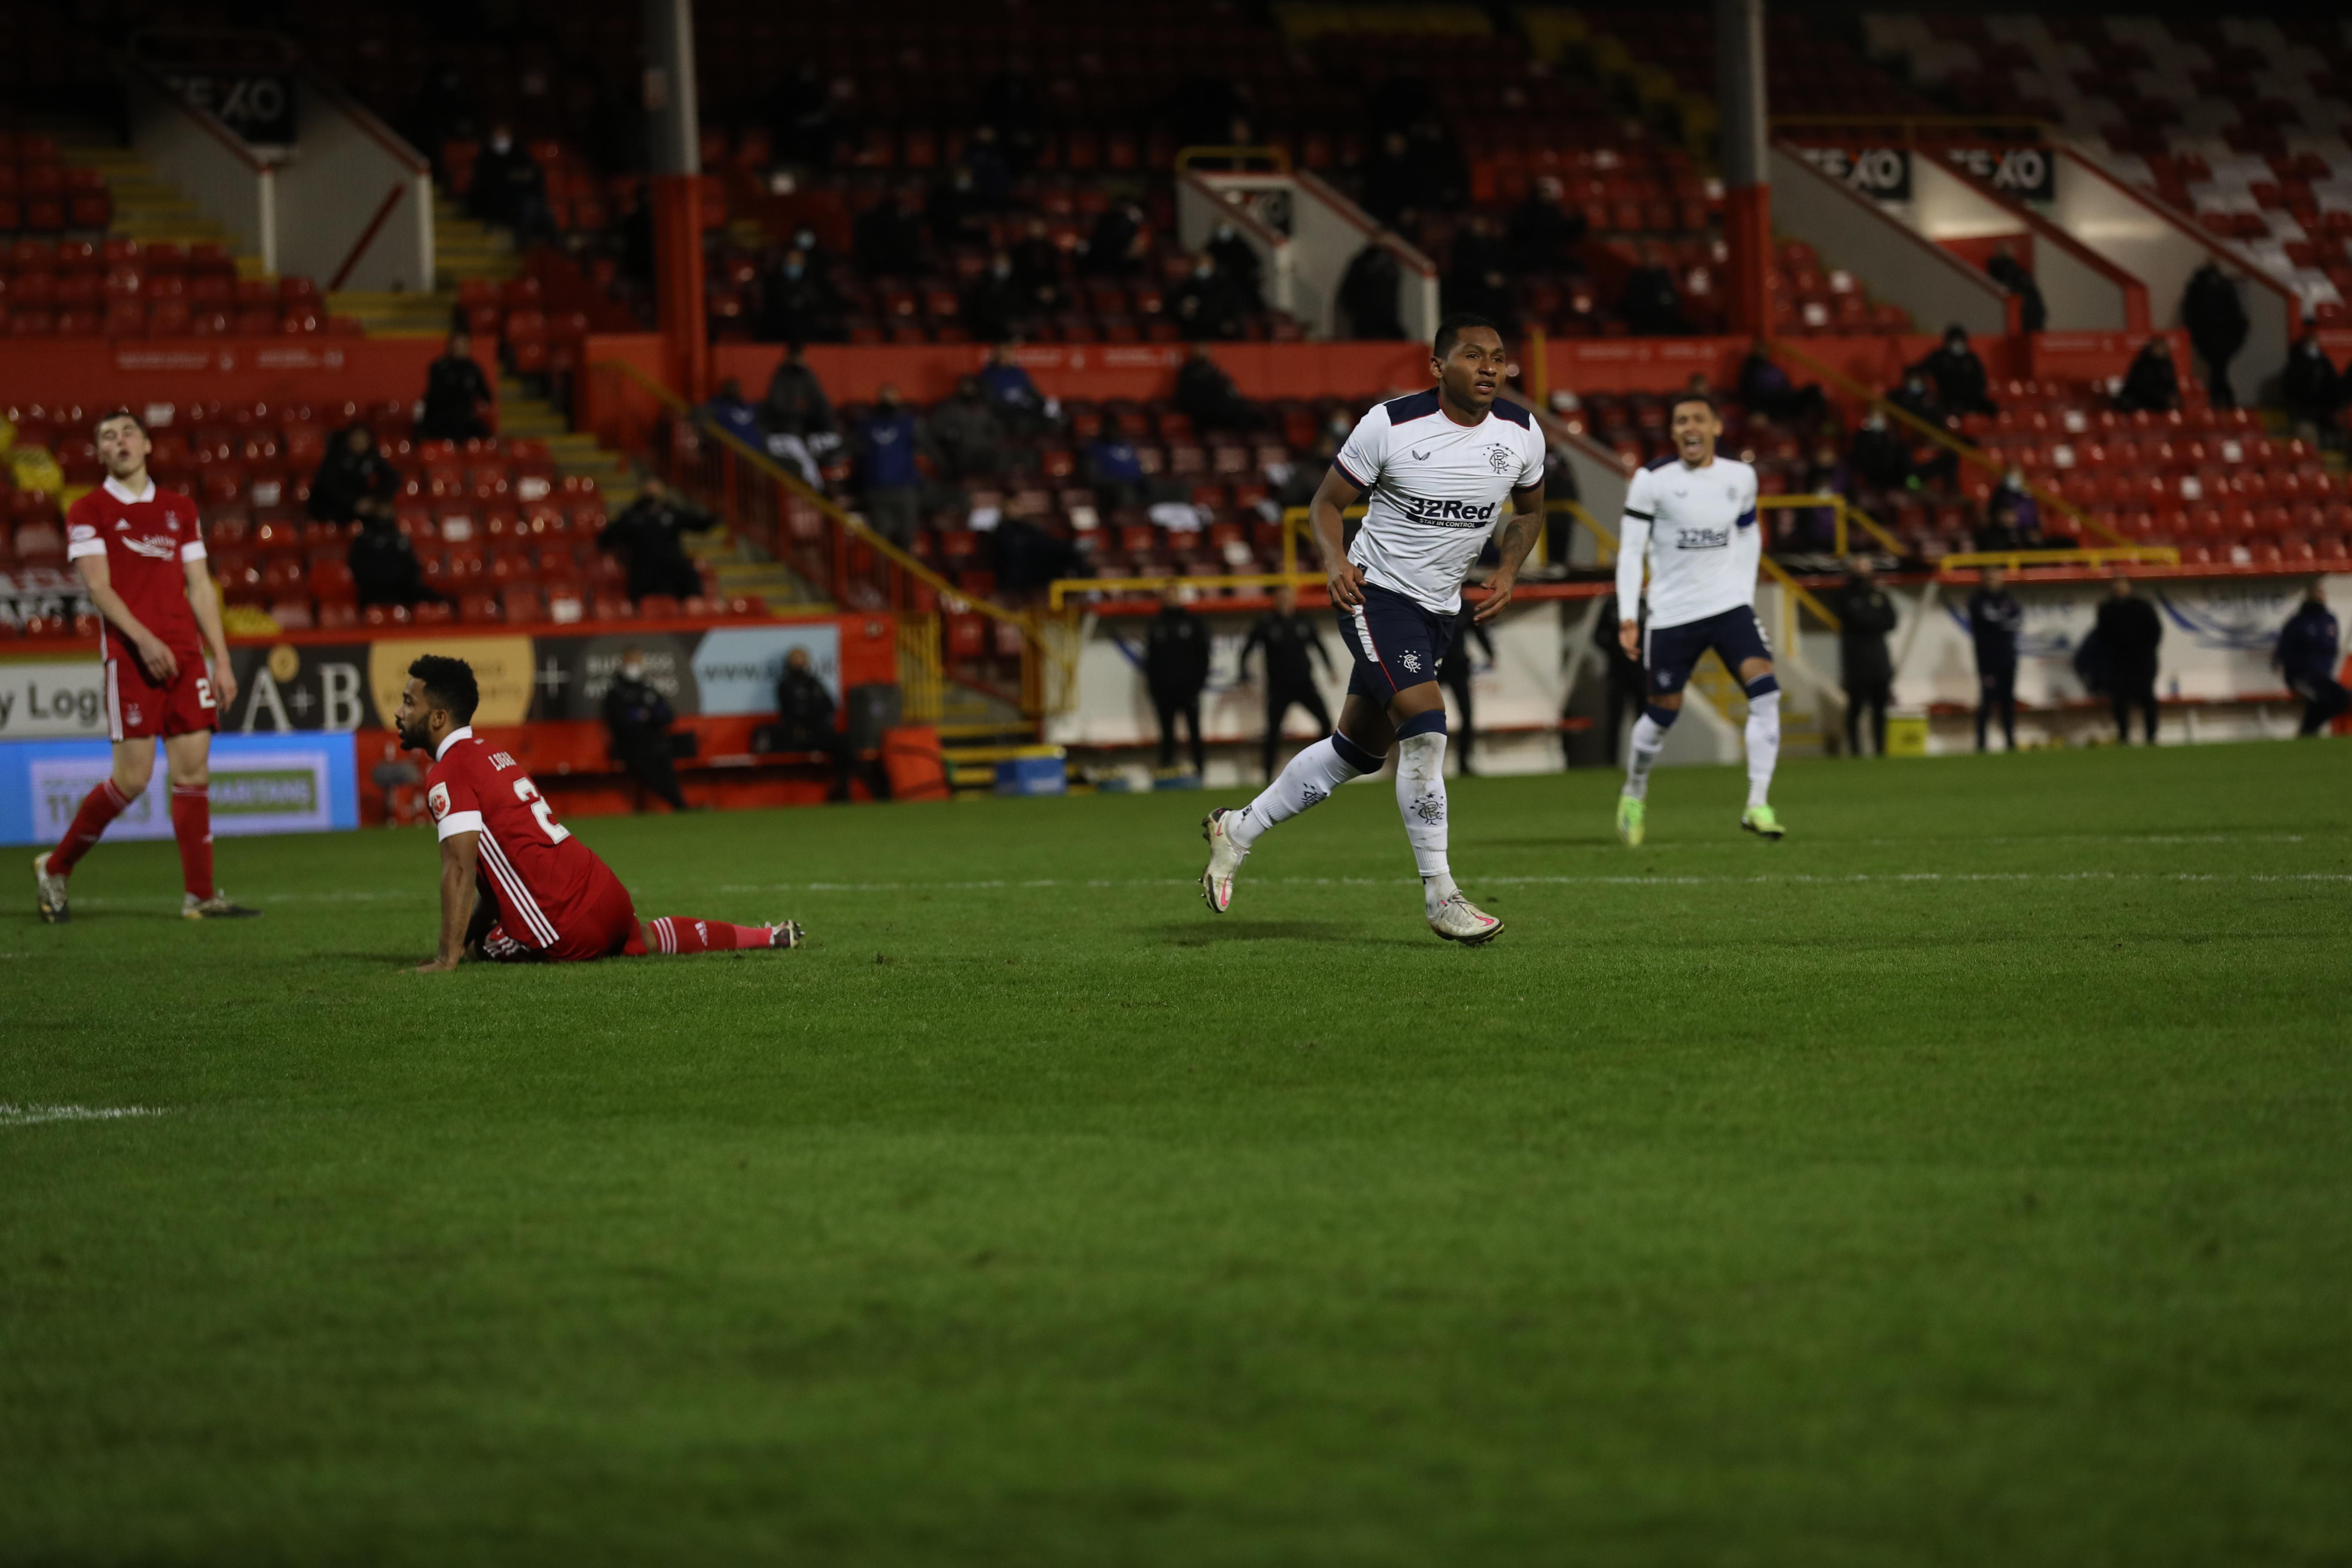 Rangers secure a win against Aberdeen thanks to Alfredo Morelos' brace